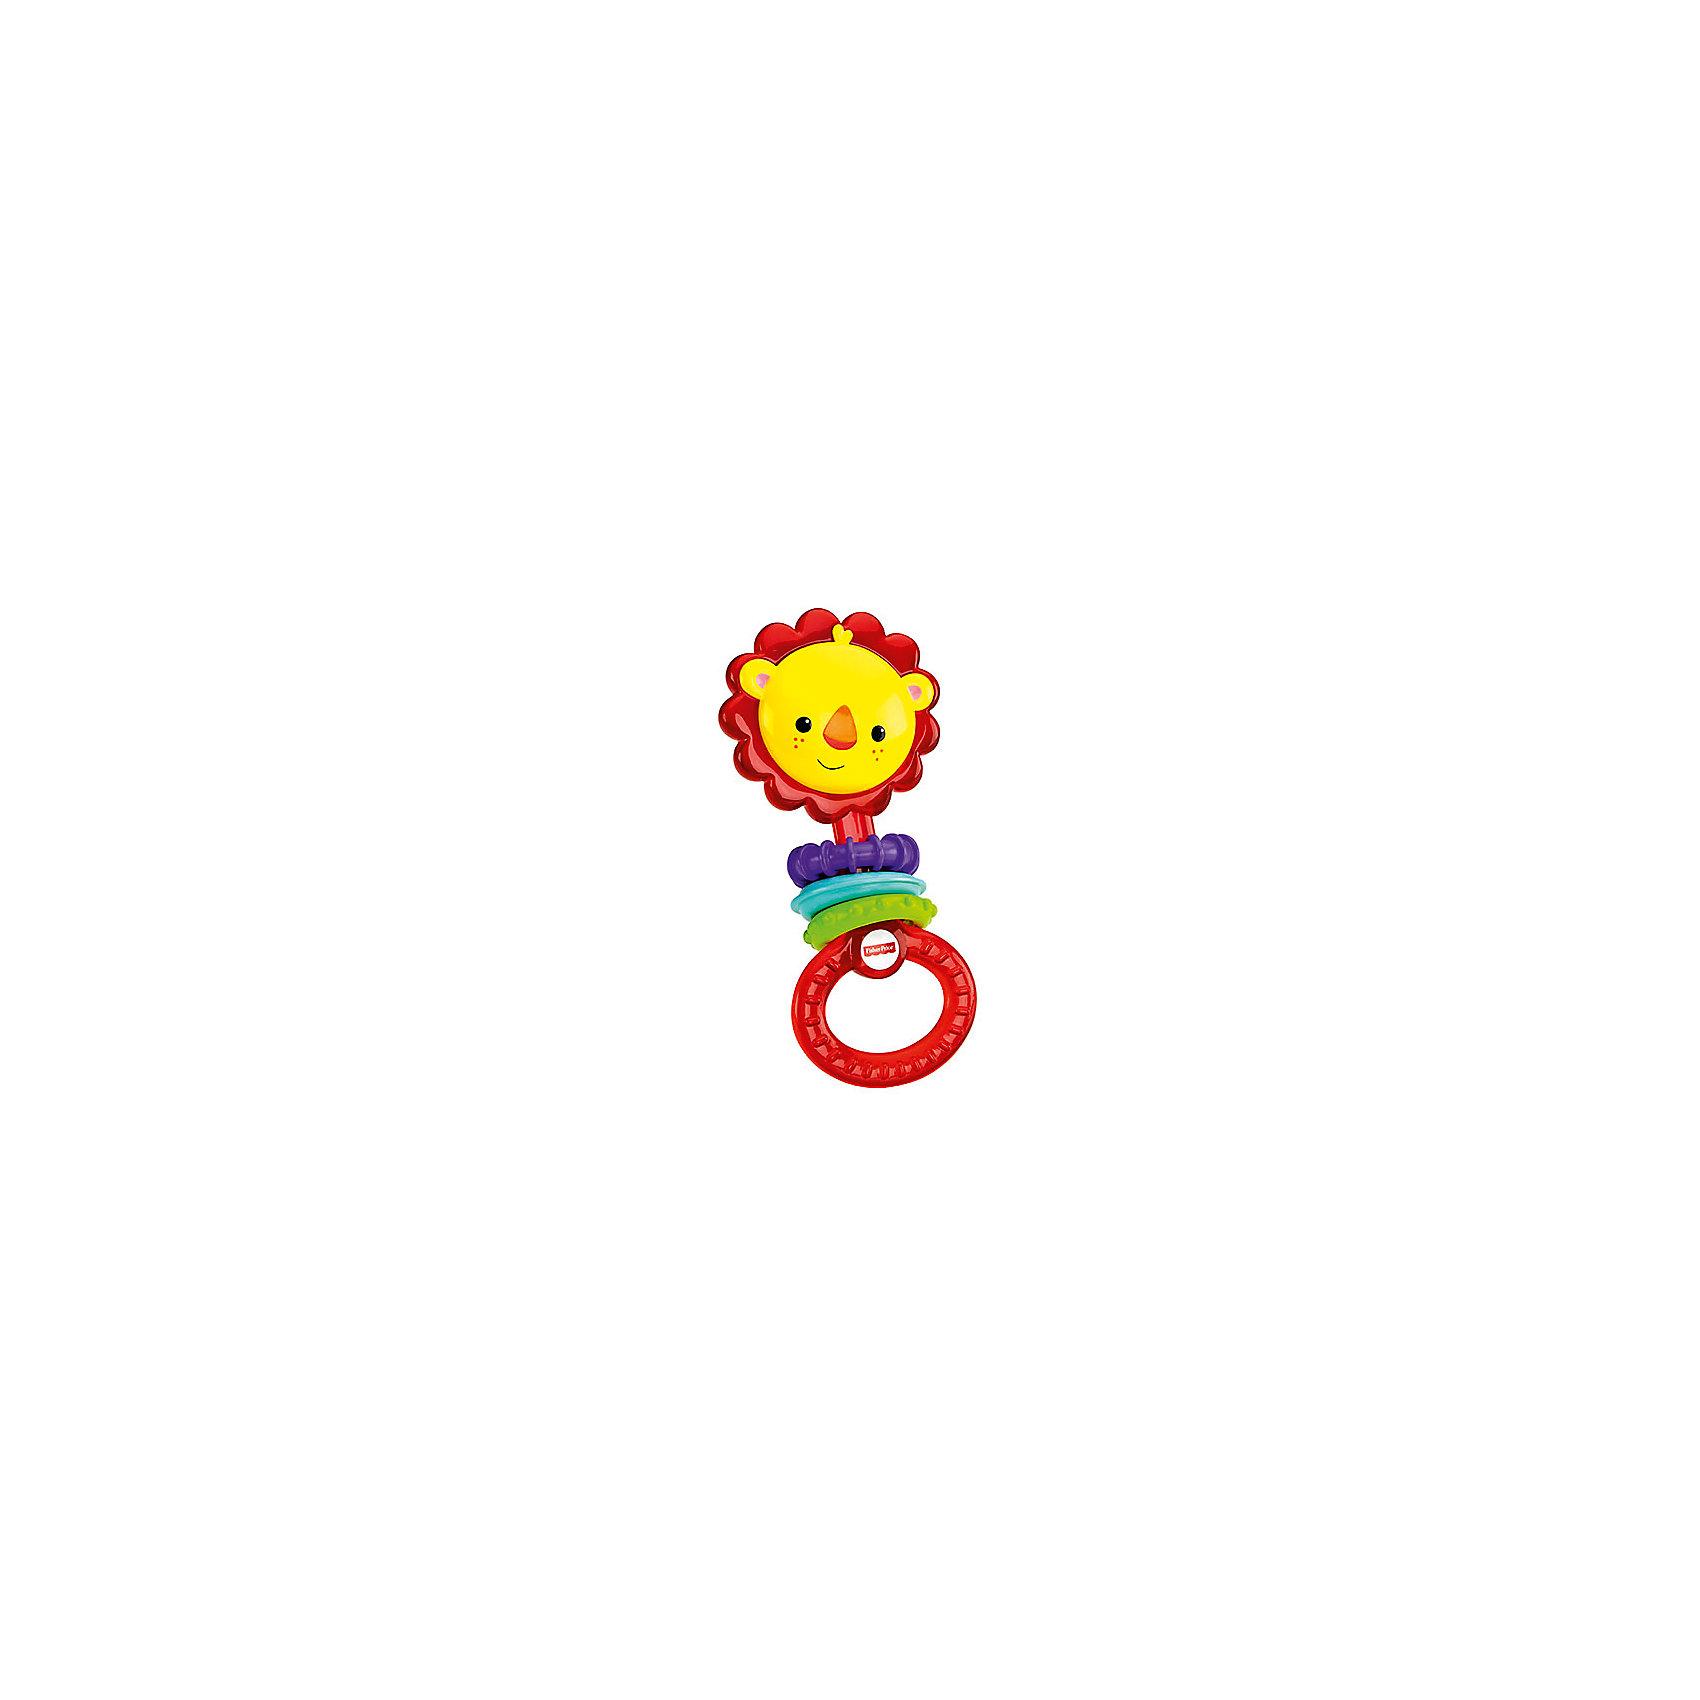 Mattel Погремушка-прорезыватель Fisher-Price fisher price яблочко прорезыватель разнофактурное